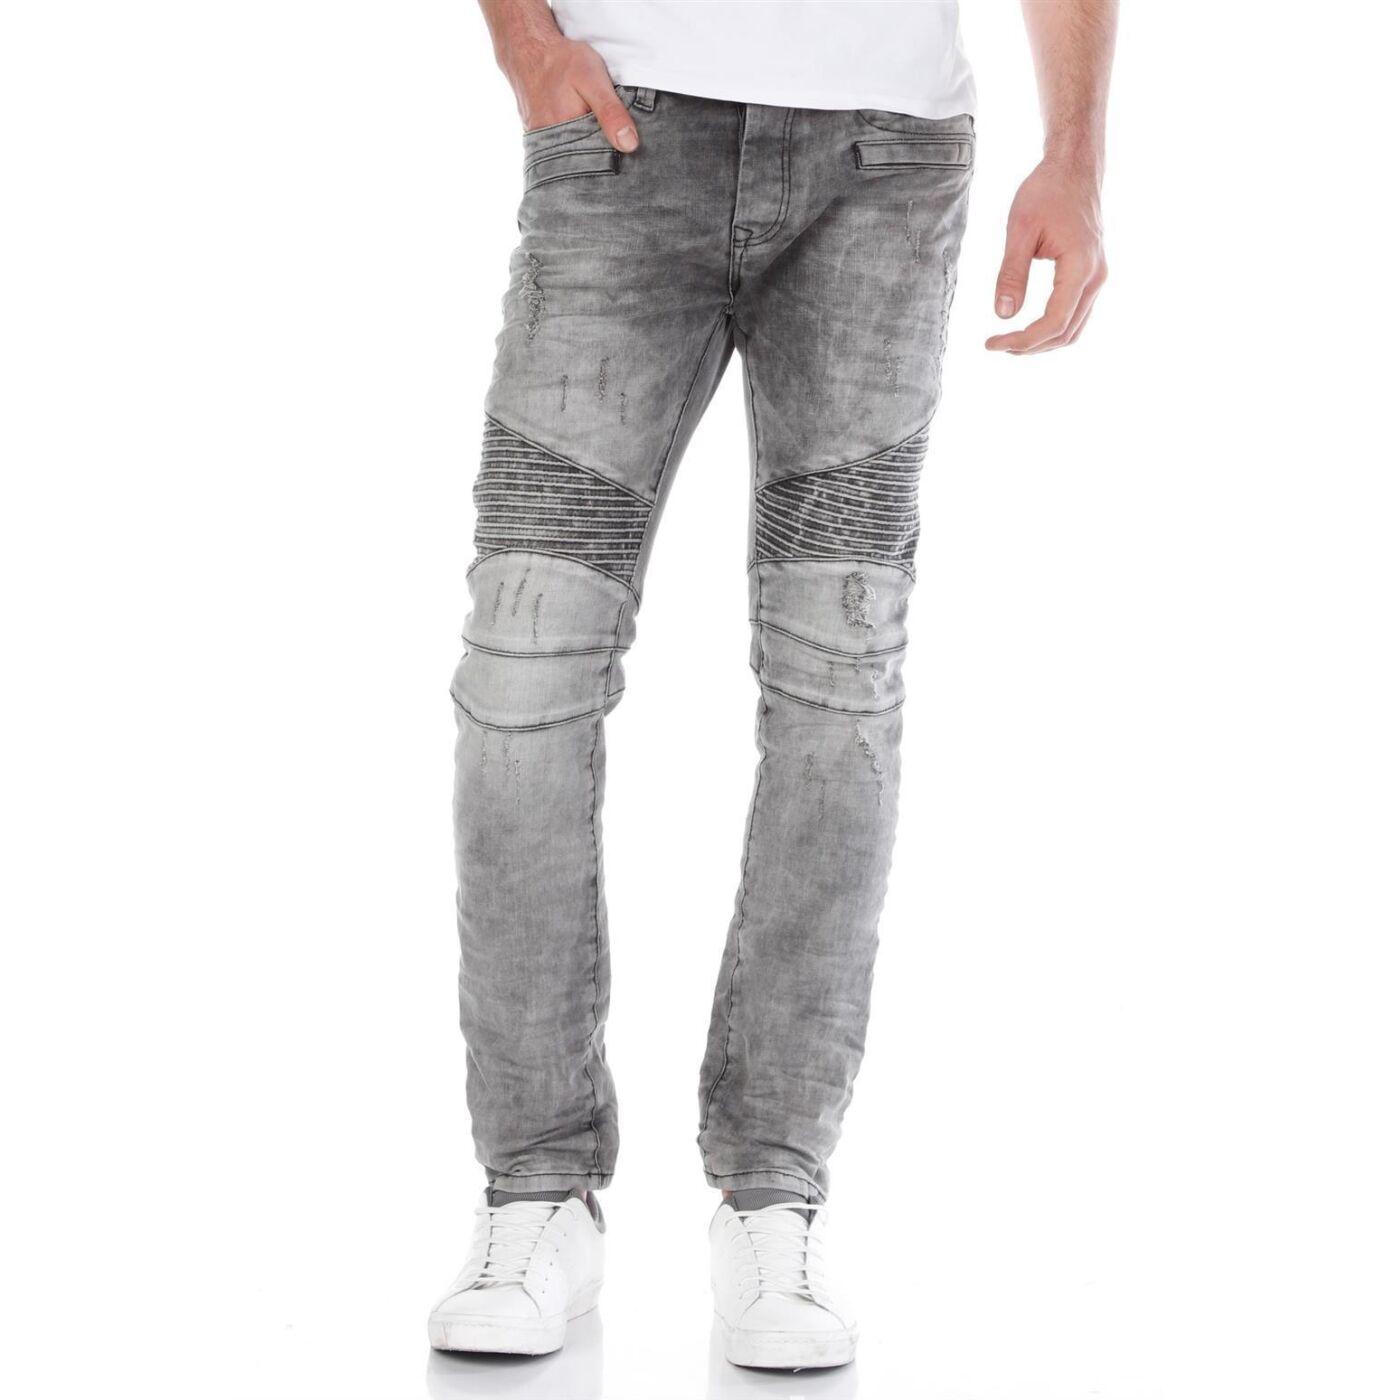 red bridge herren biker skinny jeans m4039 grey 49 99. Black Bedroom Furniture Sets. Home Design Ideas